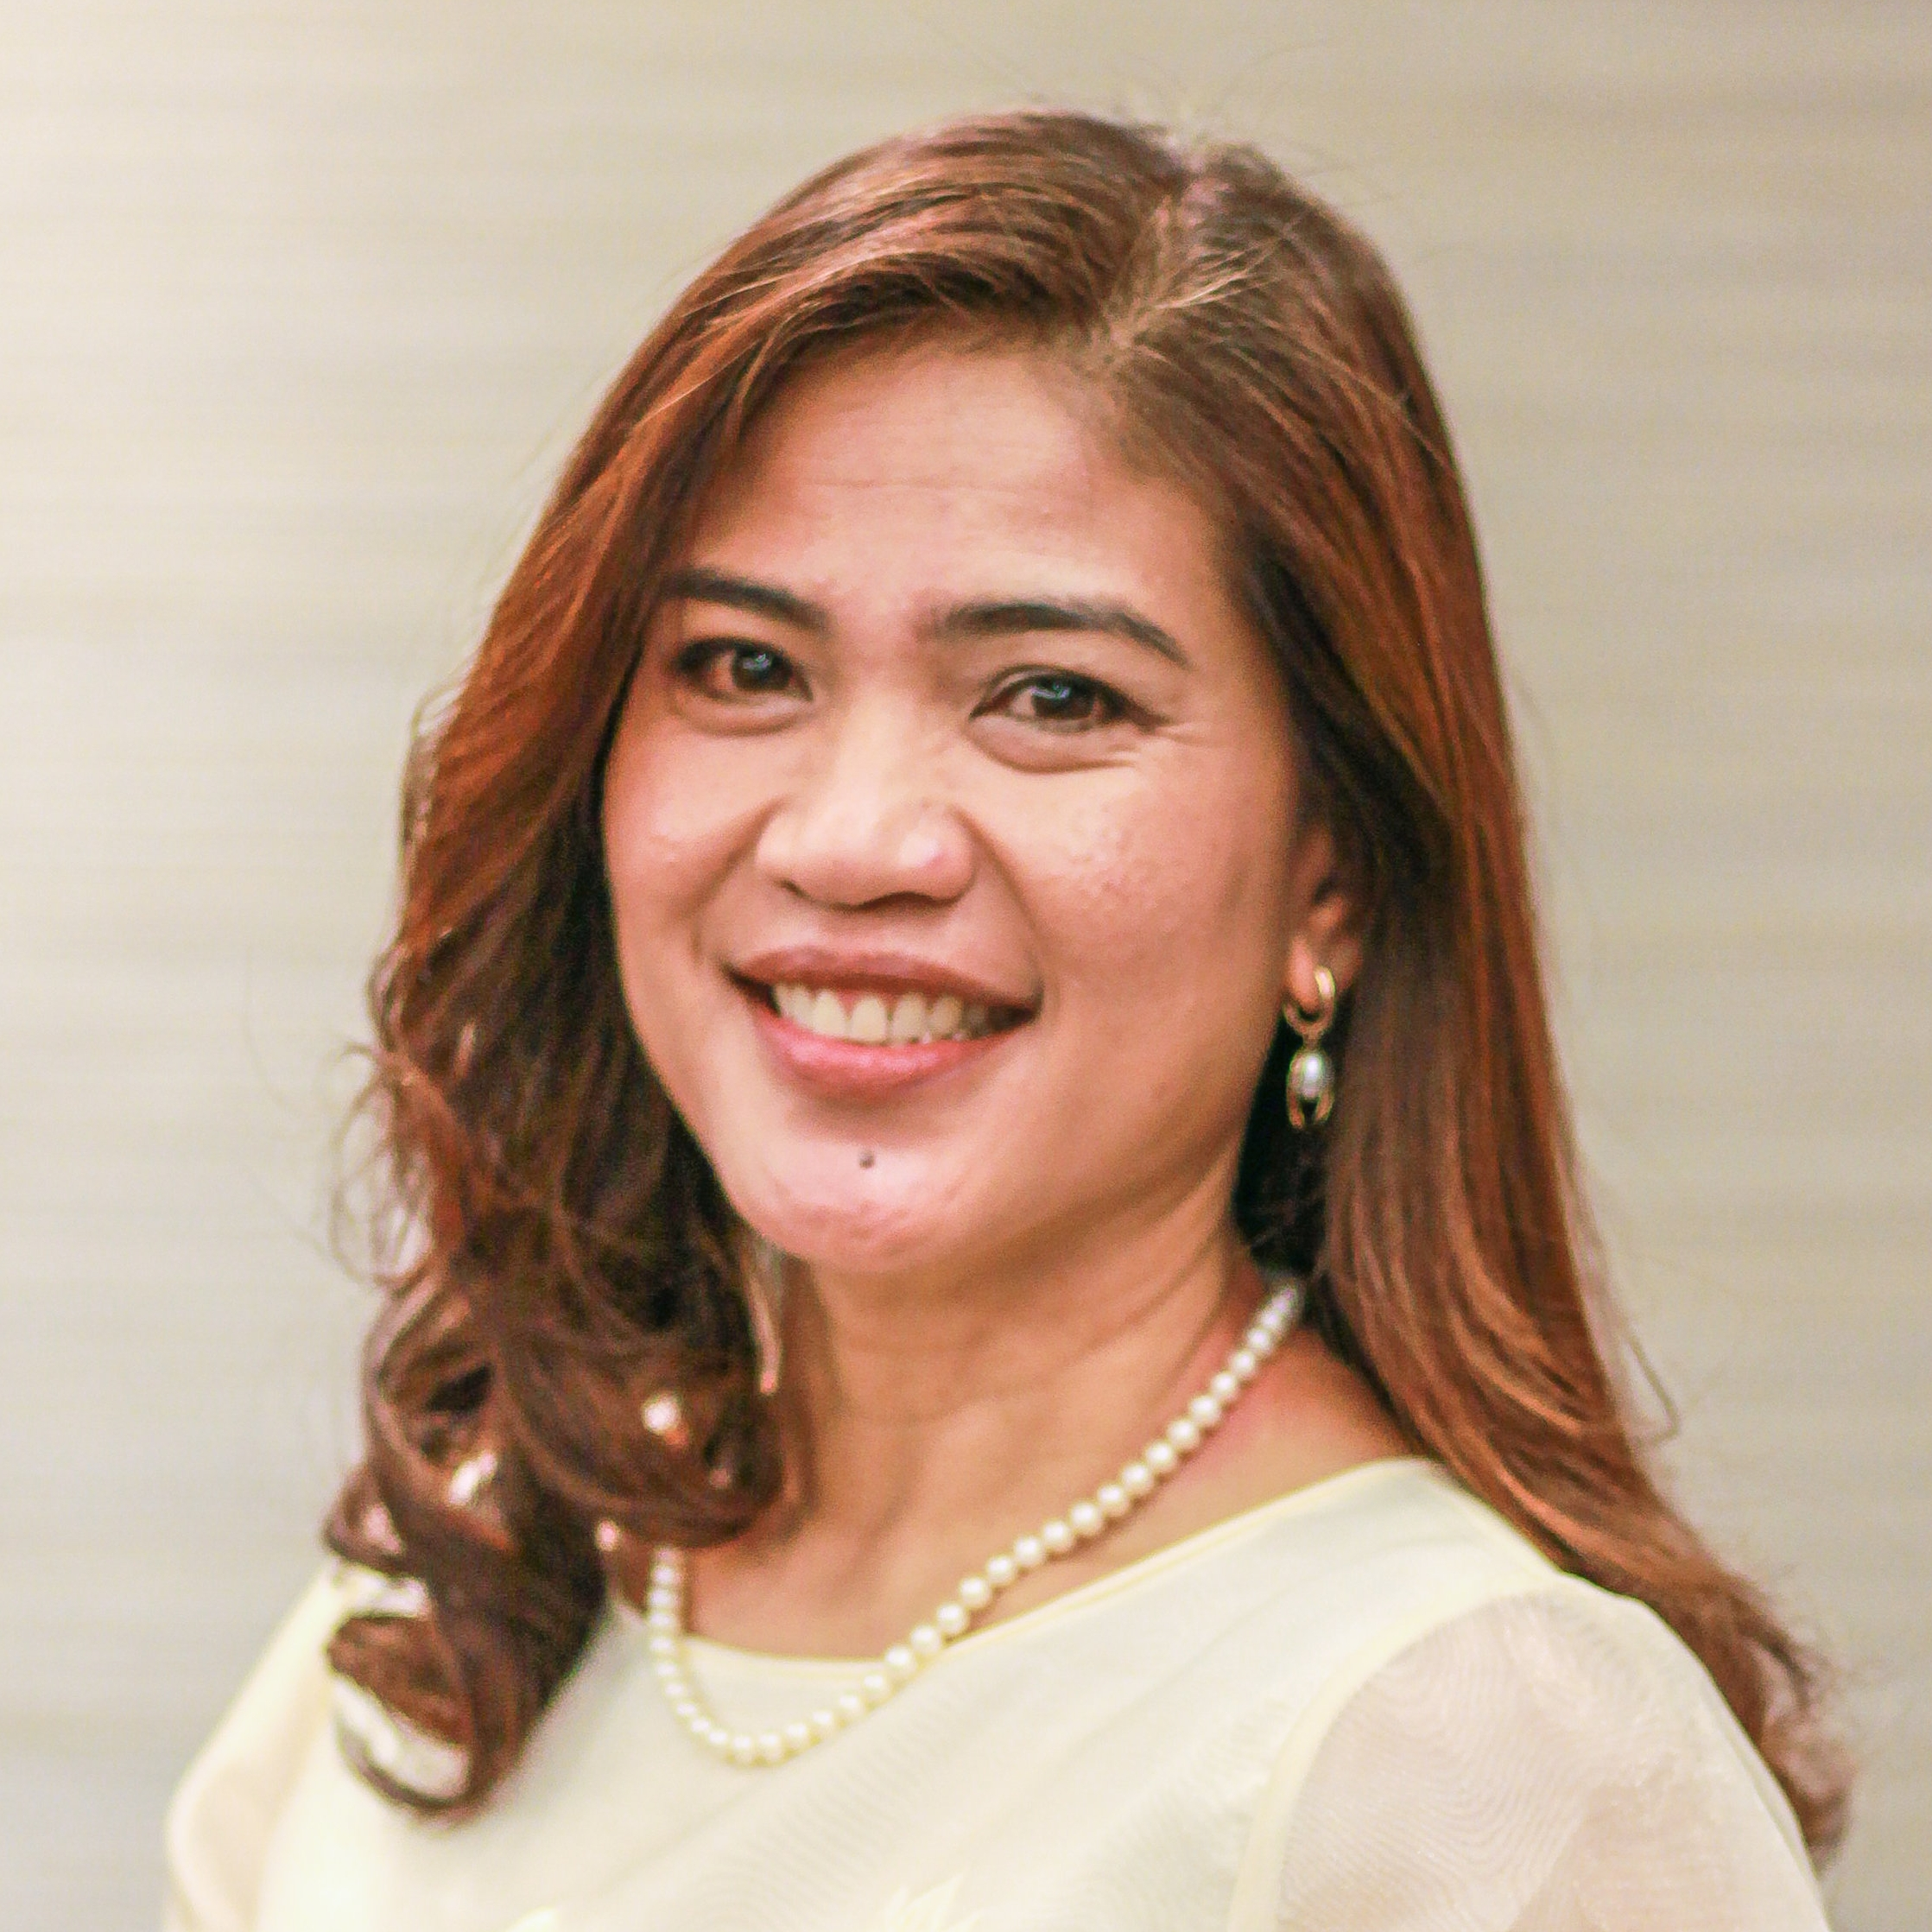 <b>Editha Tijamo Winterhalter, Ed.D.</b><br>Director of Administrative Services<br>California State University